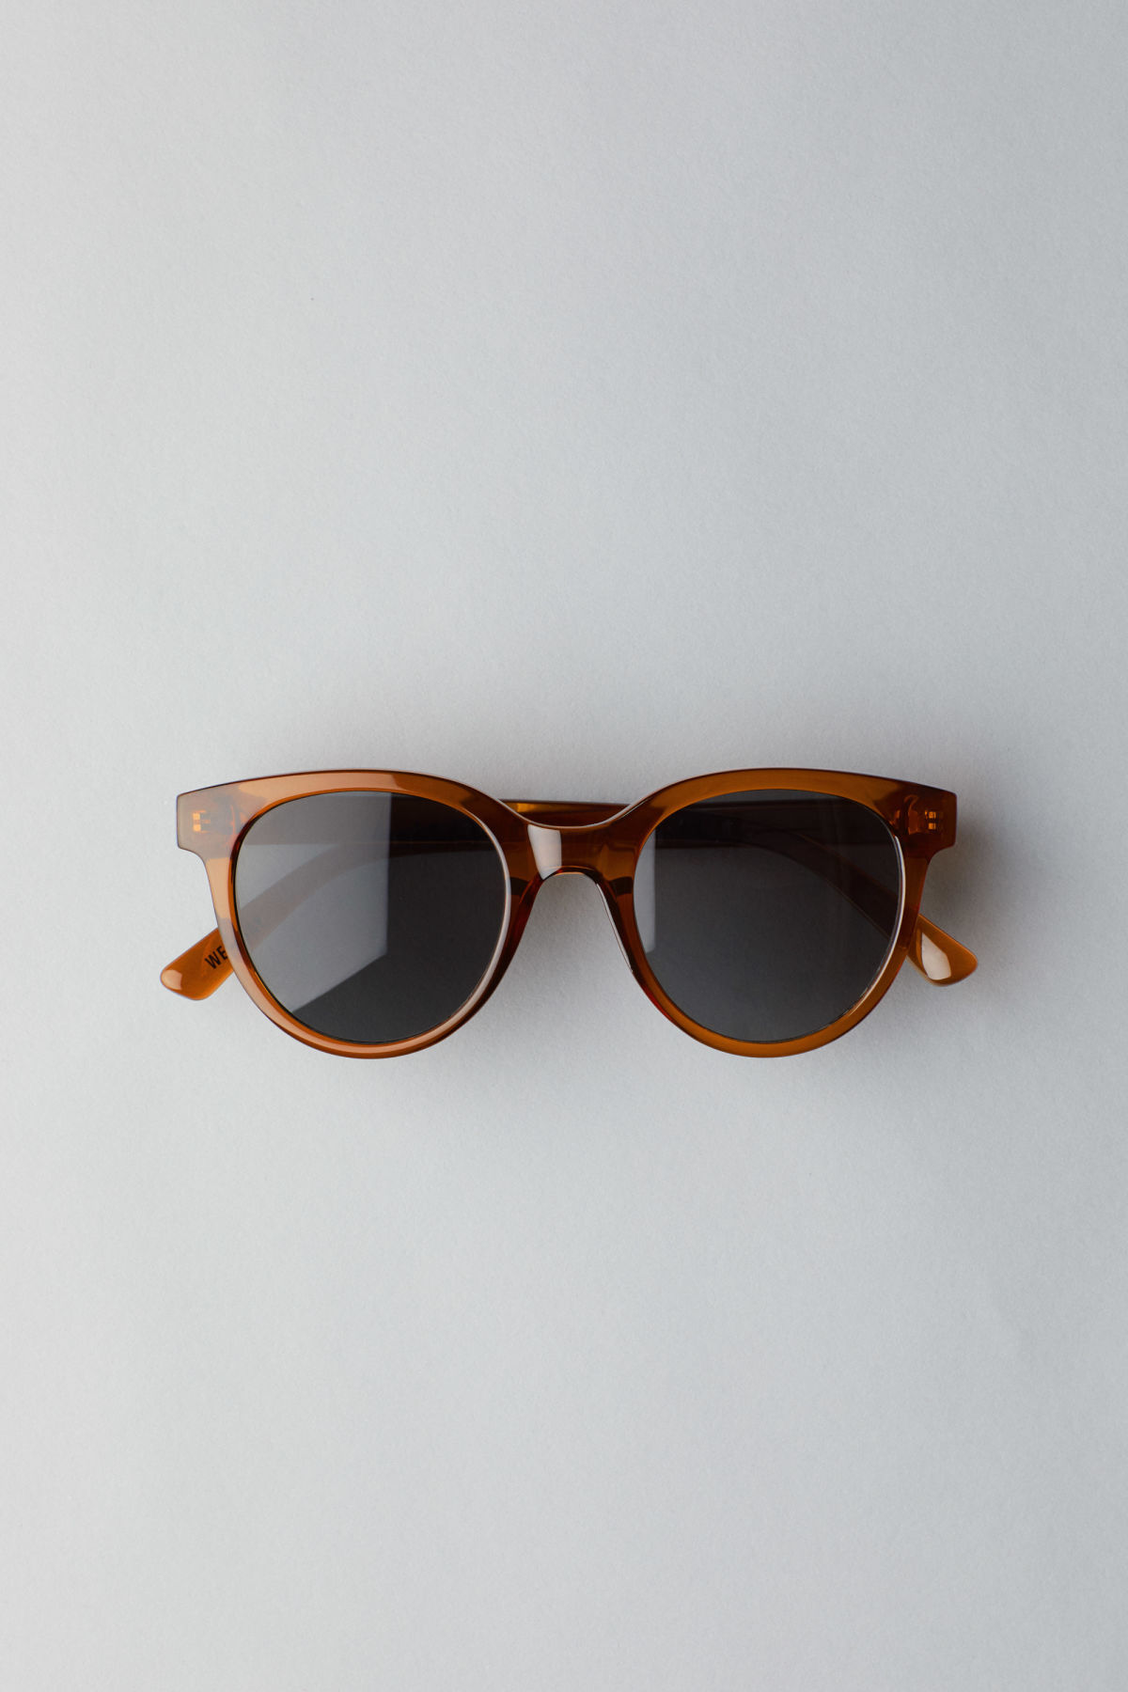 Weekday Transfer Rounded Sunglasses - Green sDGvJX